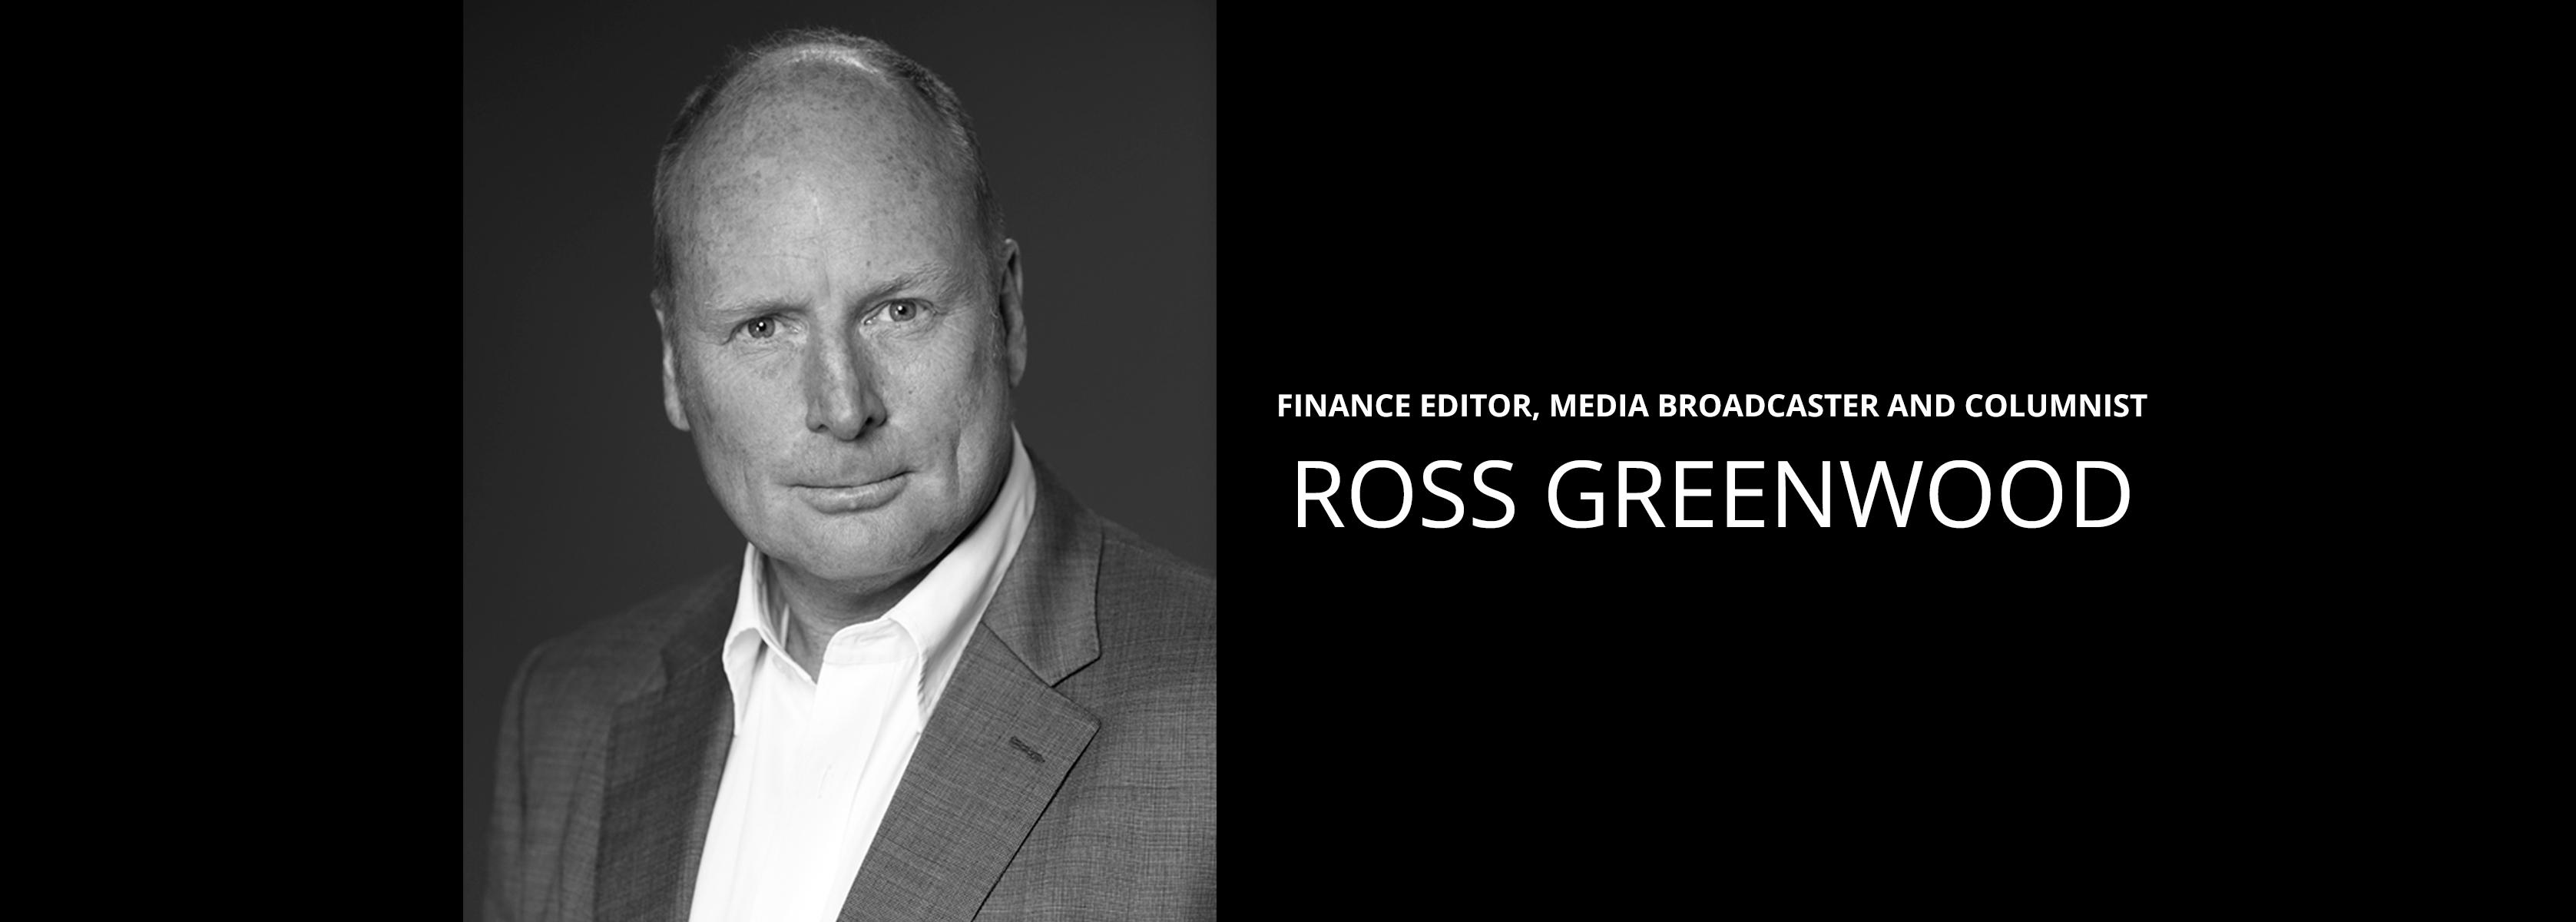 Ross Greenwood - Finance Editor, Media Broadcaster and Columnist - Bravo Talent Management